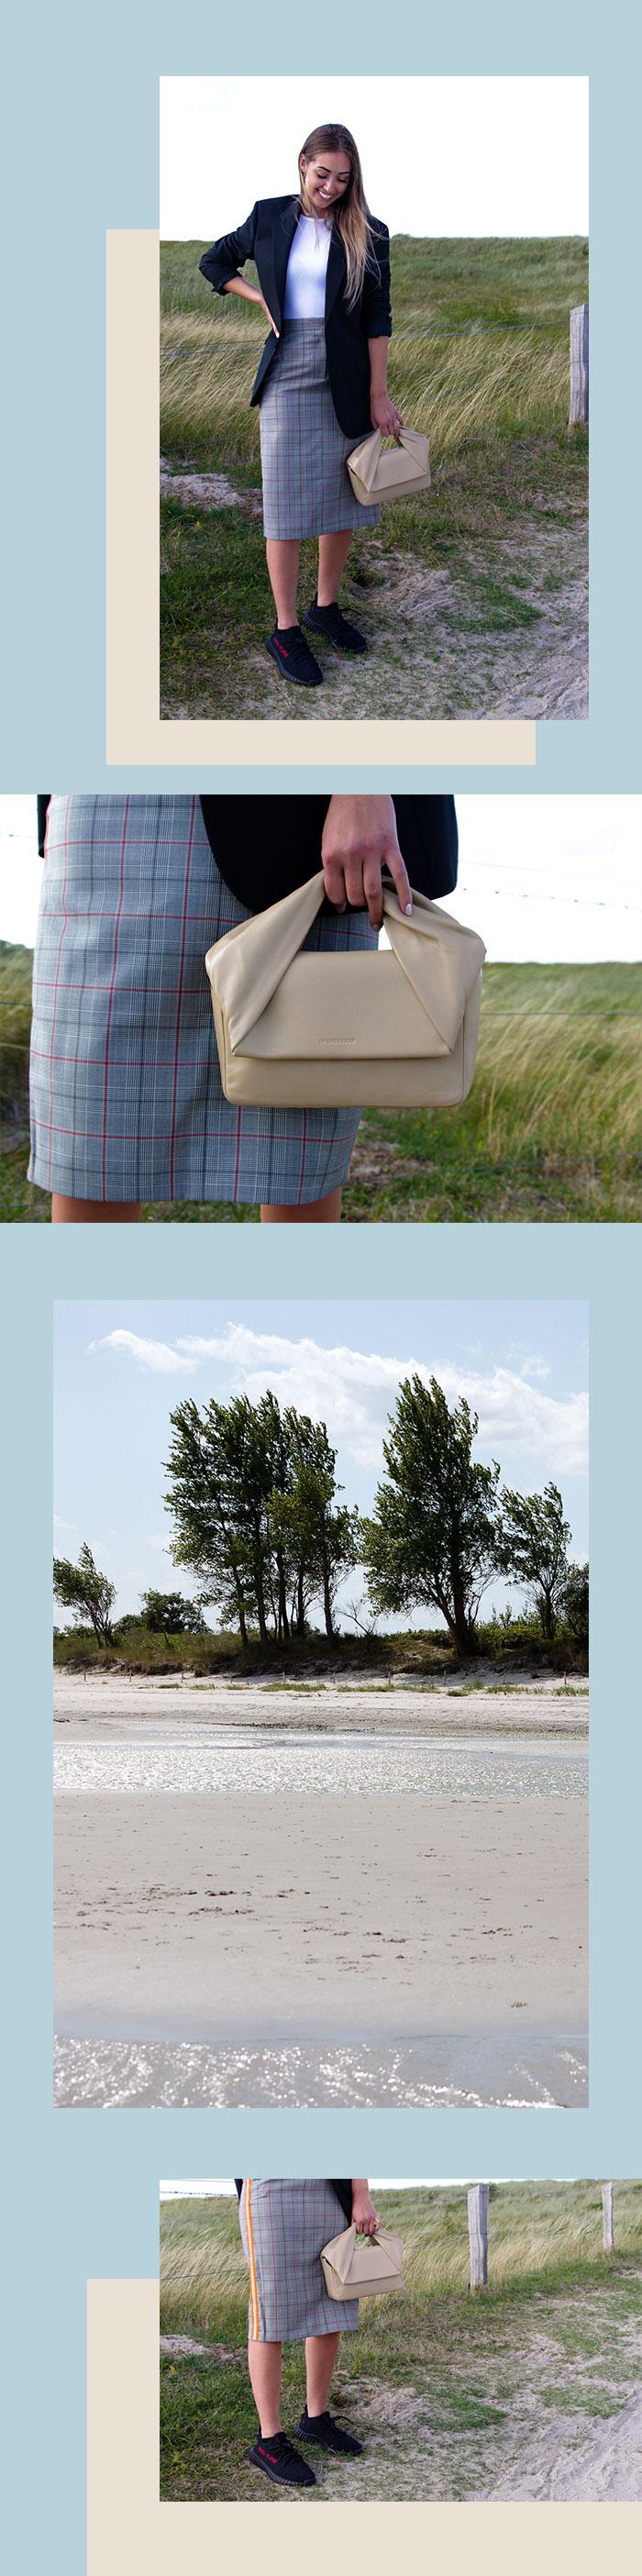 Übergangsmode: Zwischen Sommer & Herbst